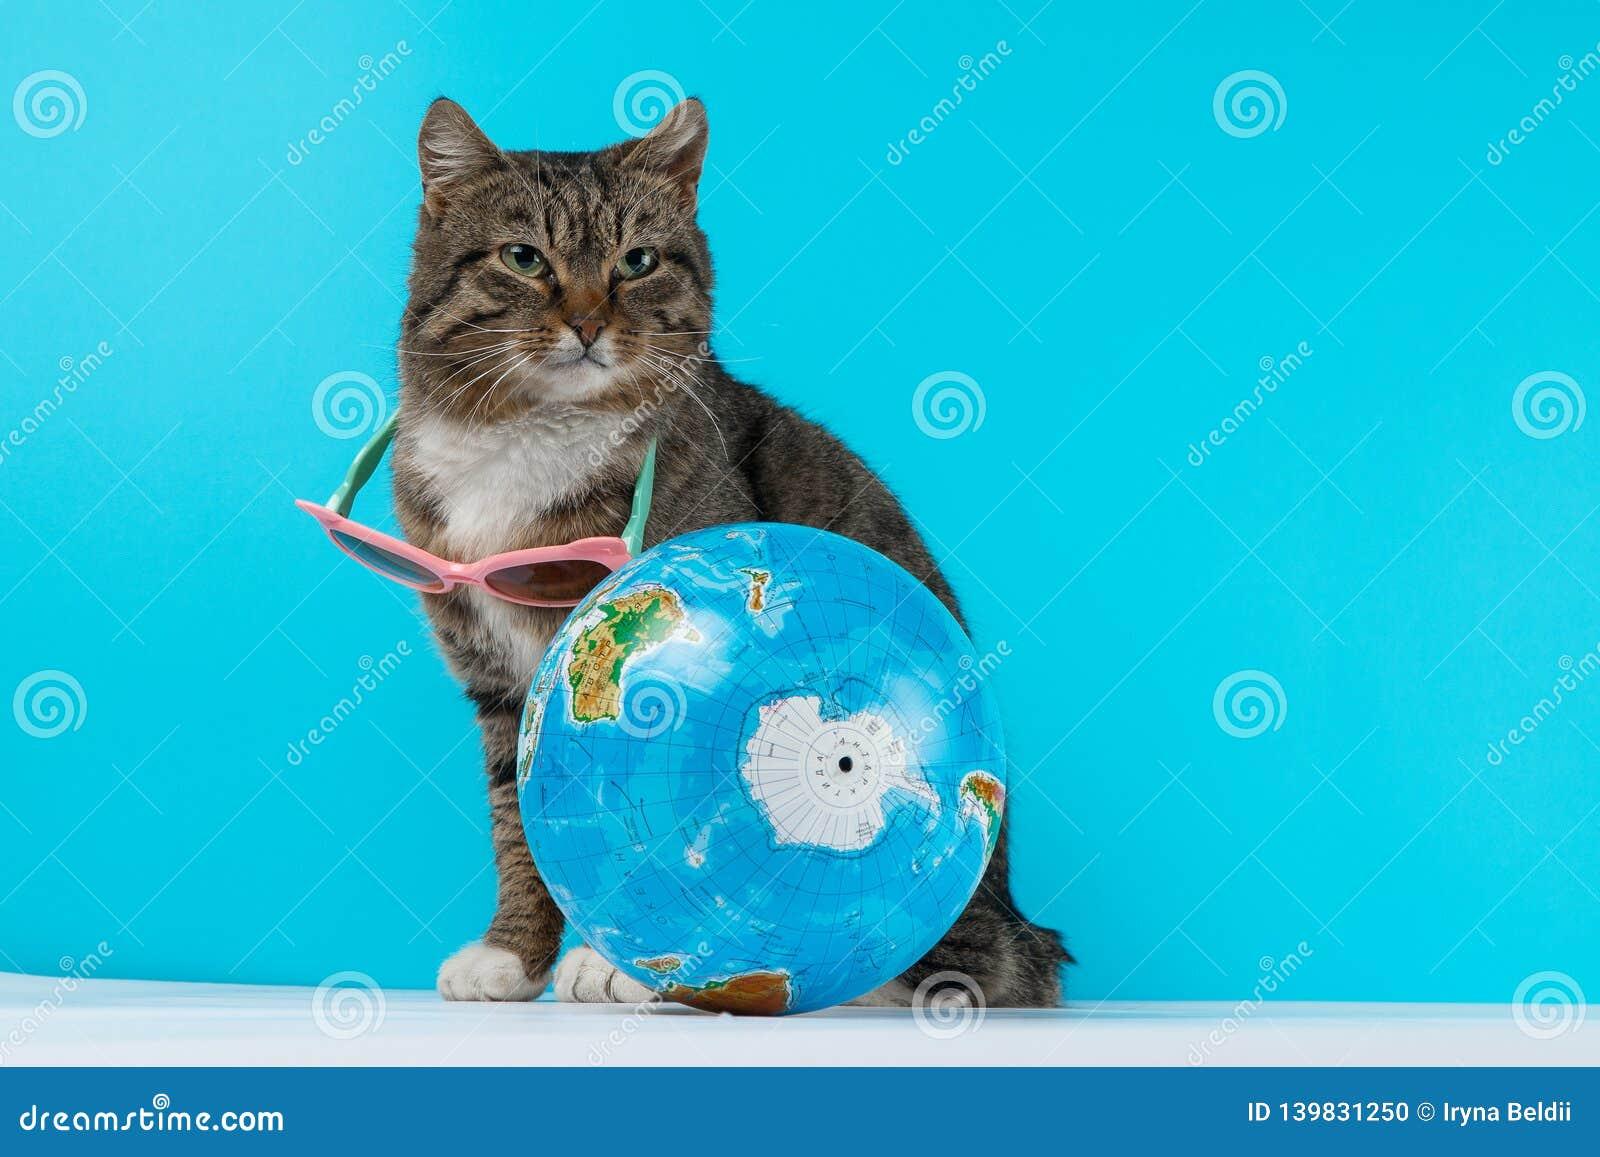 Cat traveler. cat meets on vacation